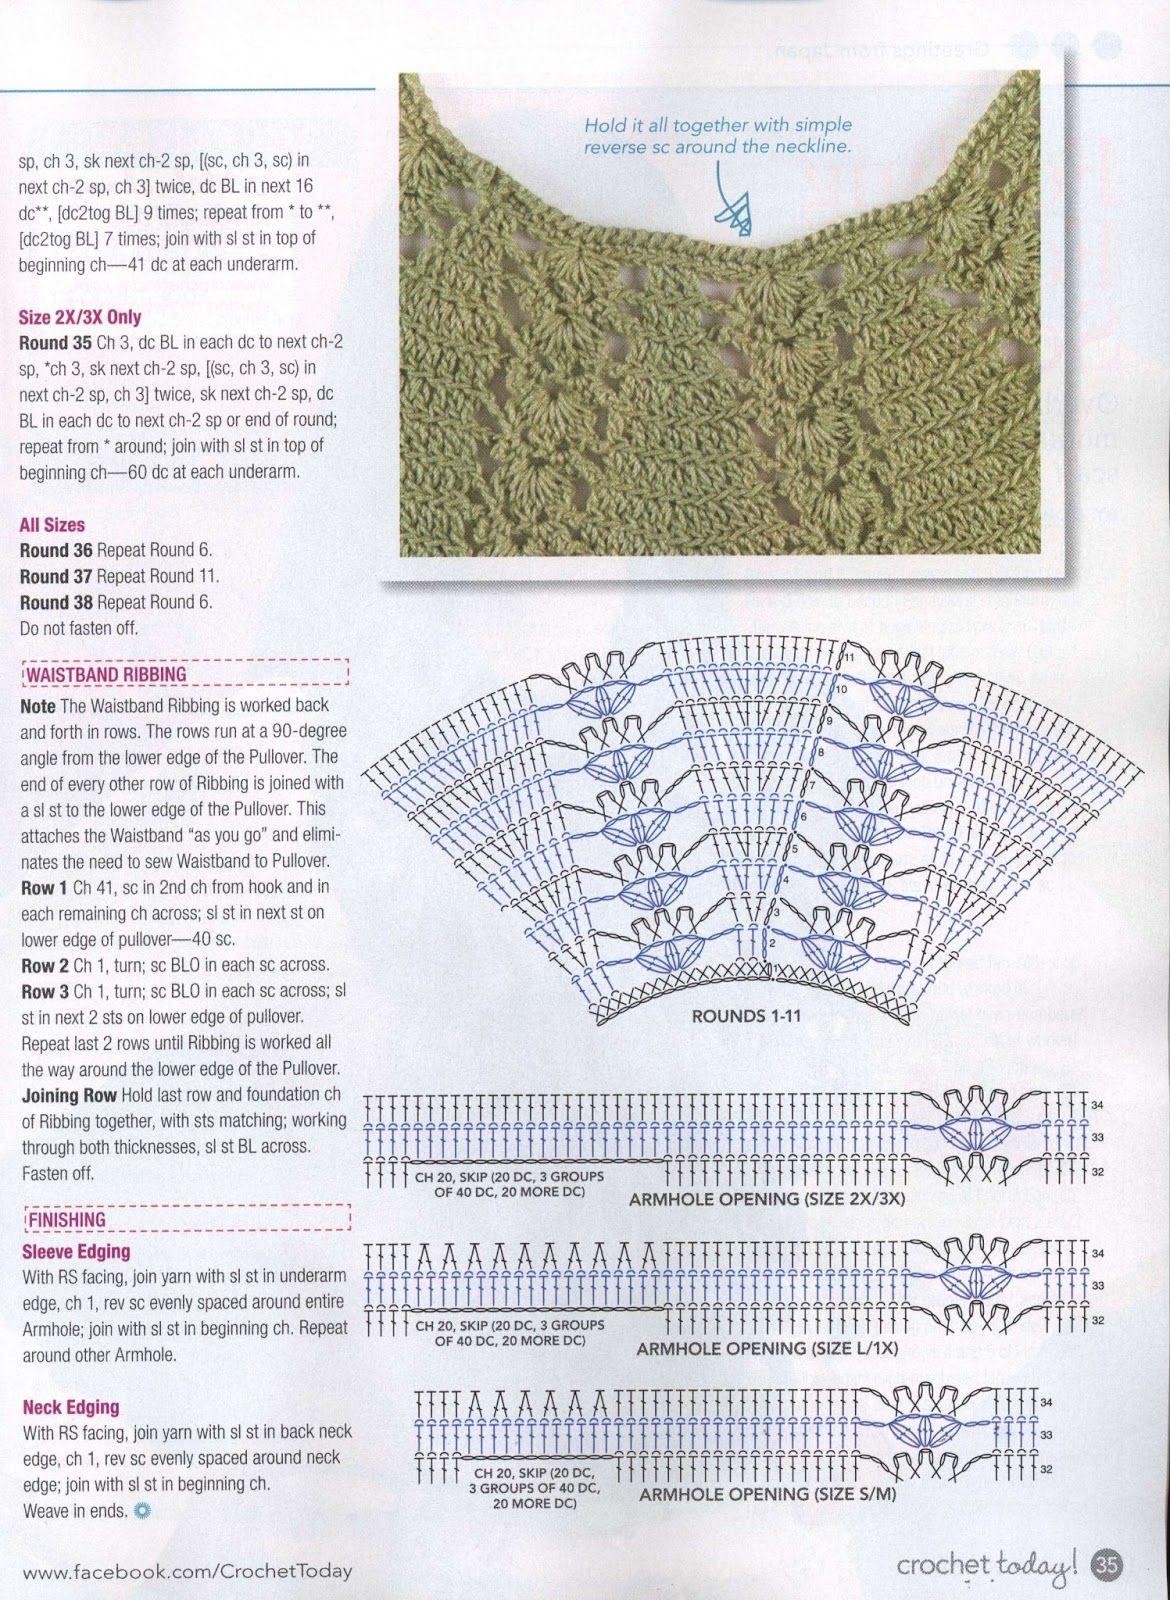 Blusa Verde de Crochet | Crochet Top 1 | Pinterest | Blusas, Blusas ...